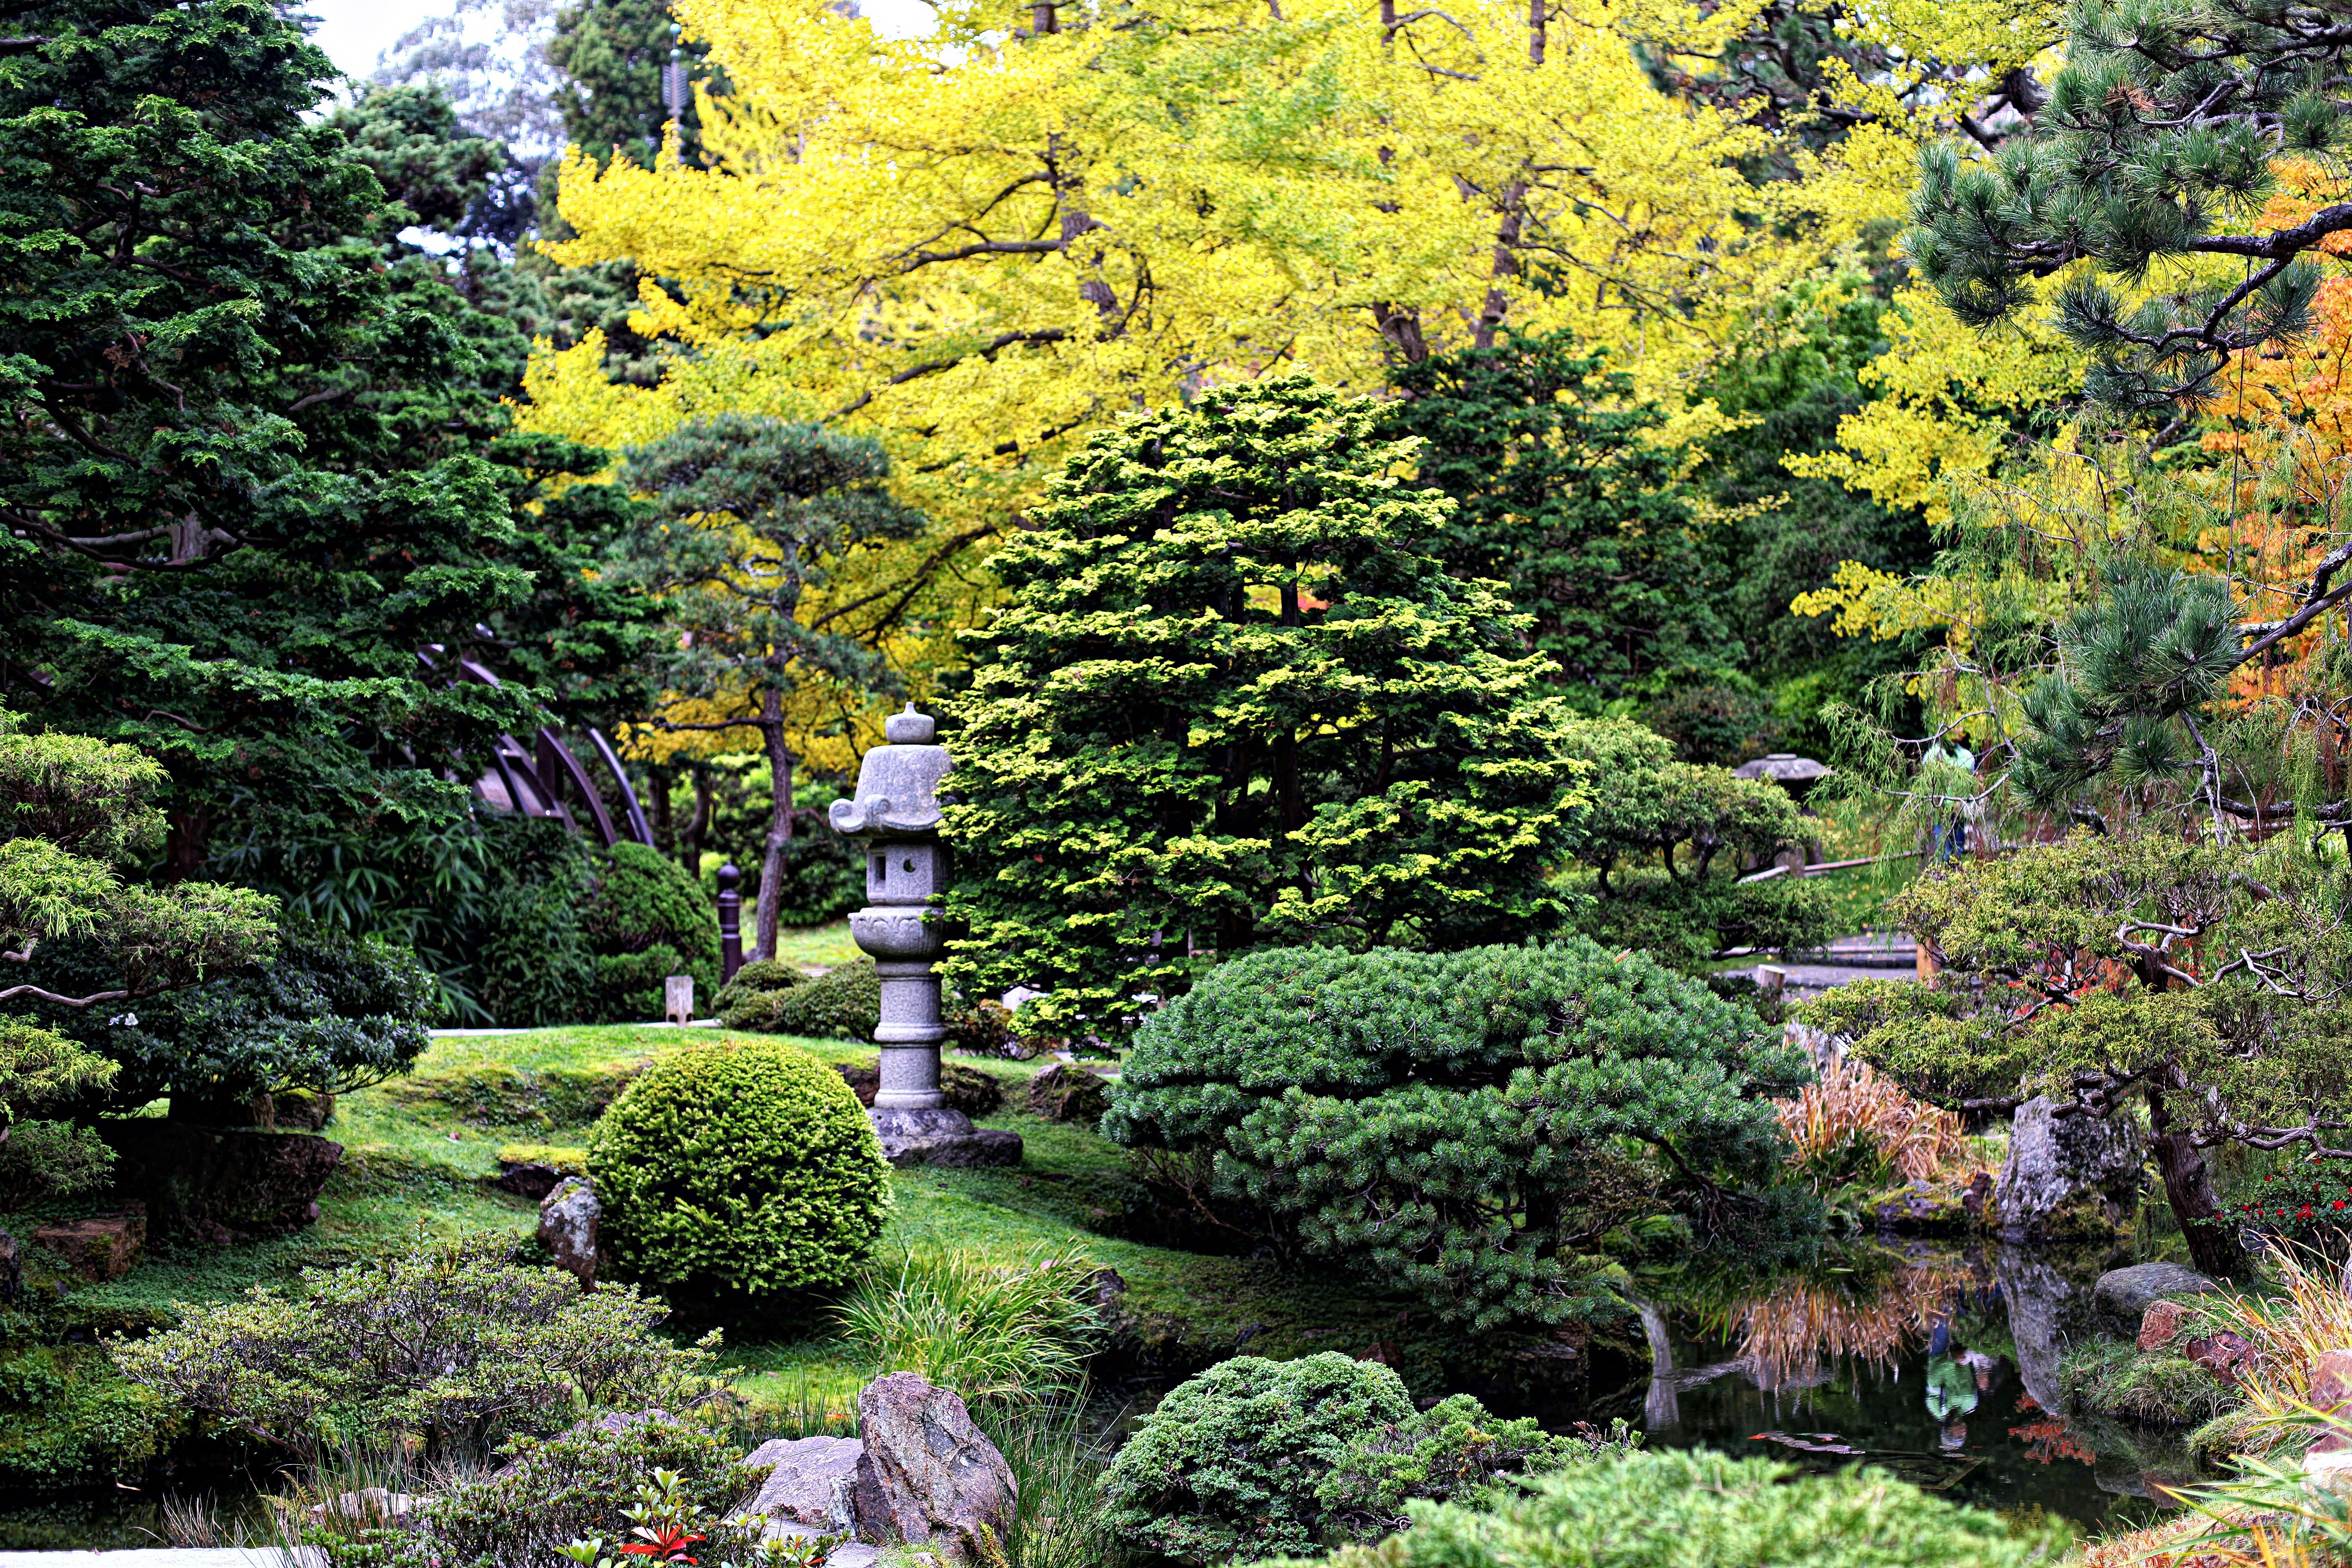 The Graceful Gardener The Japanese Tea Garden in Golden